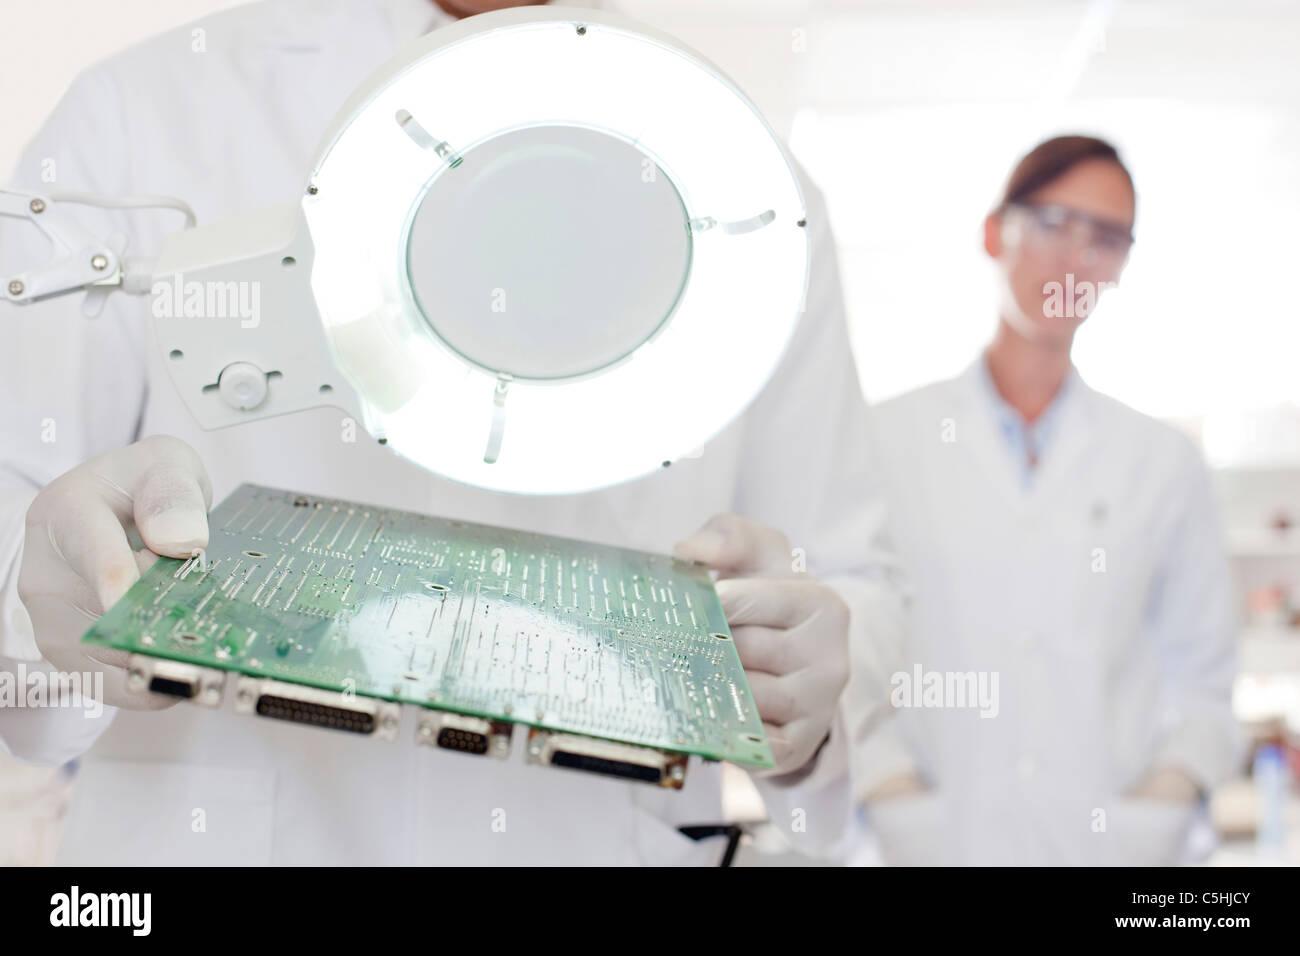 Circuit board manufacture Stock Photo: 37881675 - Alamy